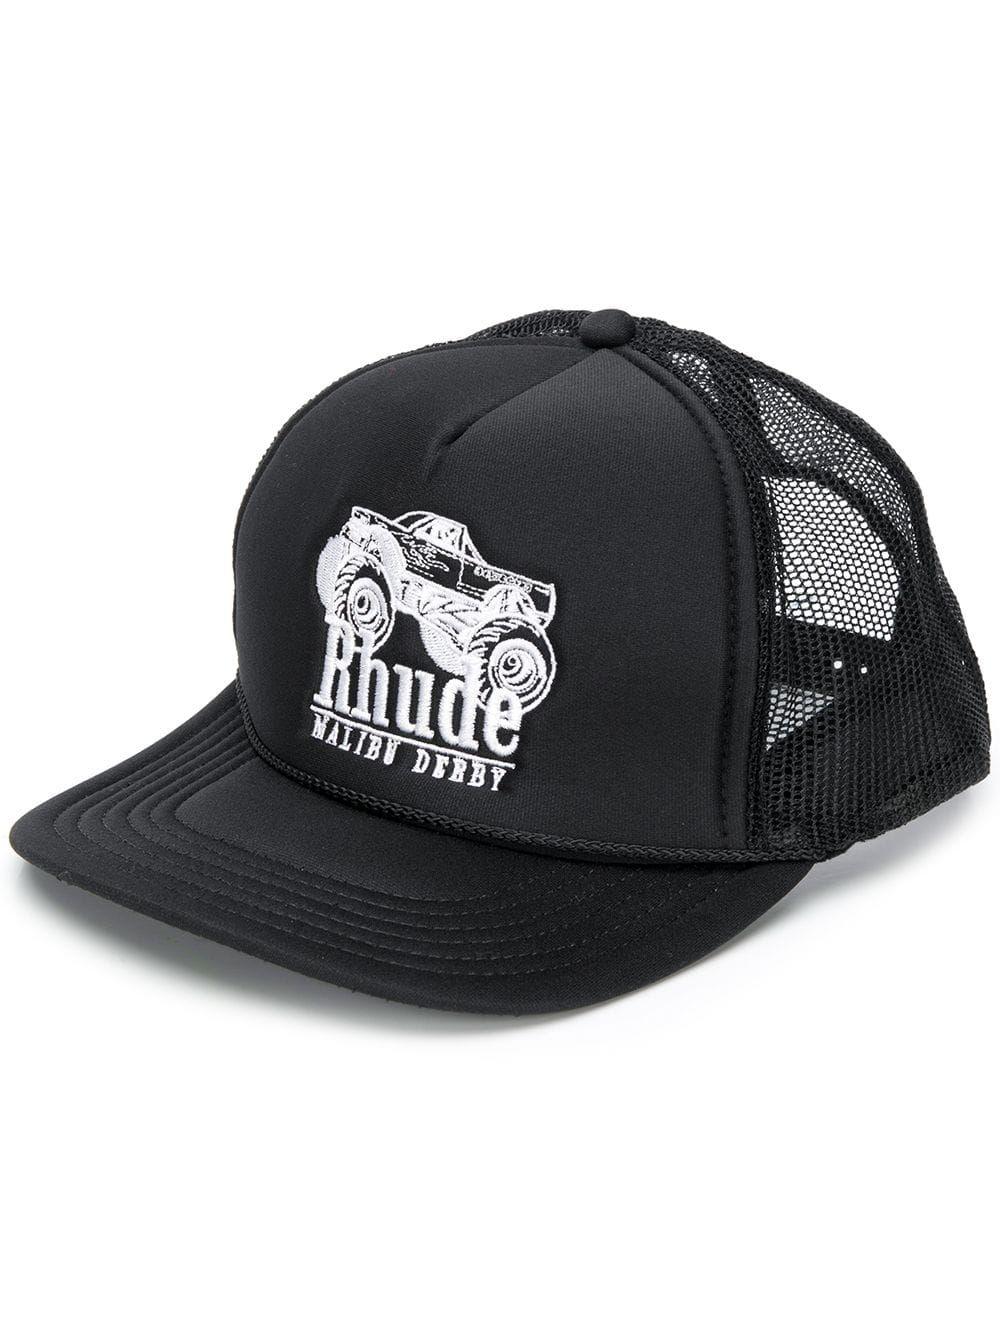 RHUDE RHUDE LOGO BASEBALL CAP - BLACK.  rhude  1010d2cc032a